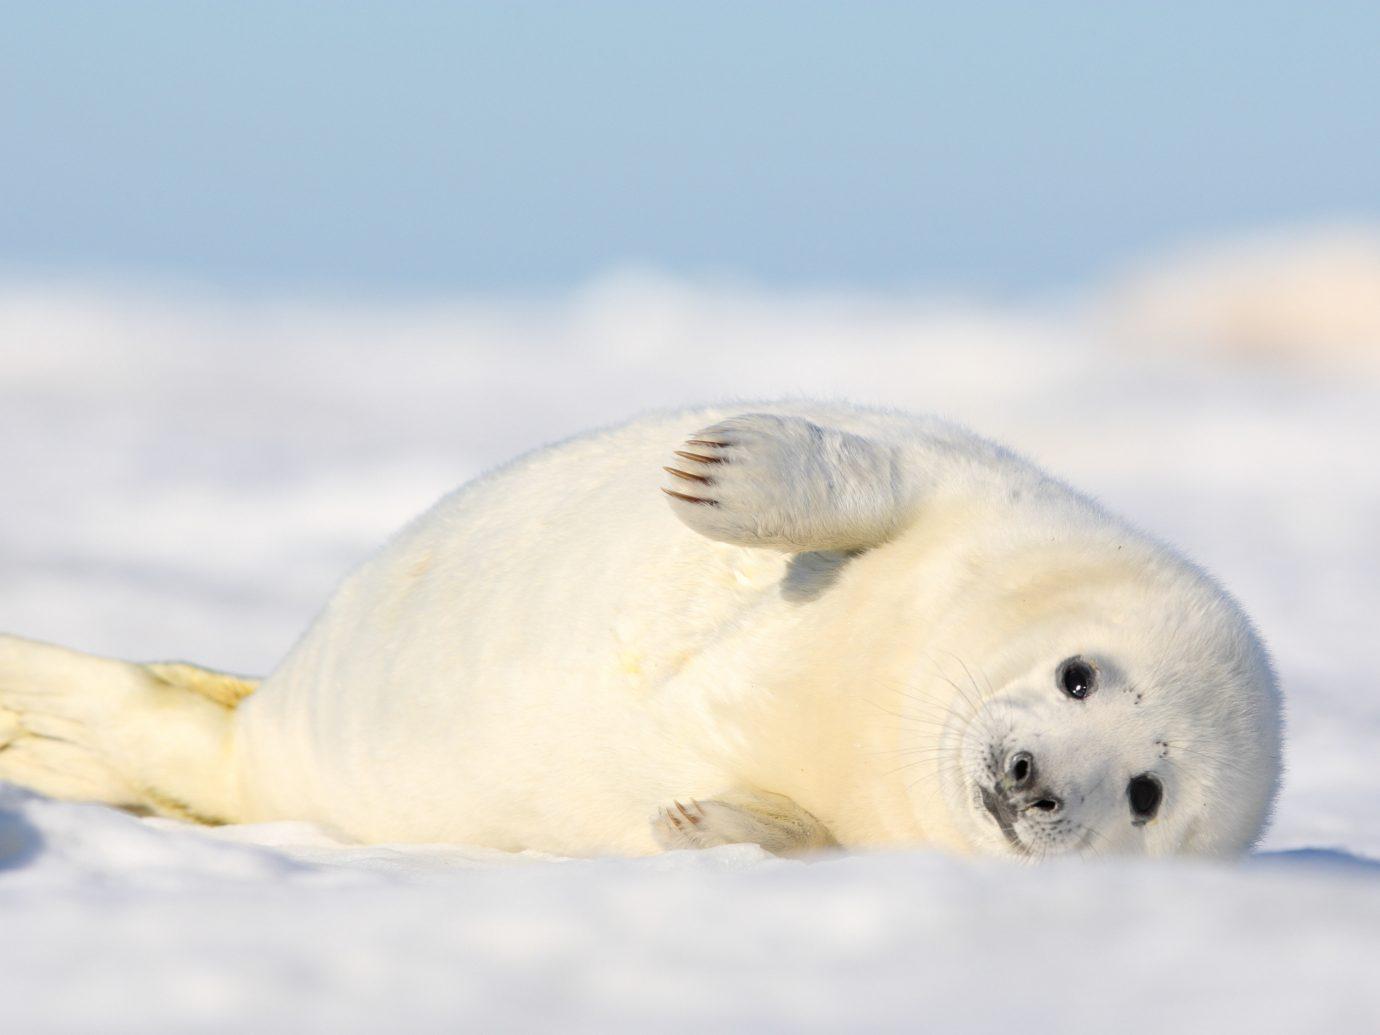 Offbeat animal polar polar bear outdoor mammal vertebrate harbor seal aquatic mammal fauna white seal bear parrot seals arctic marine mammal Bird